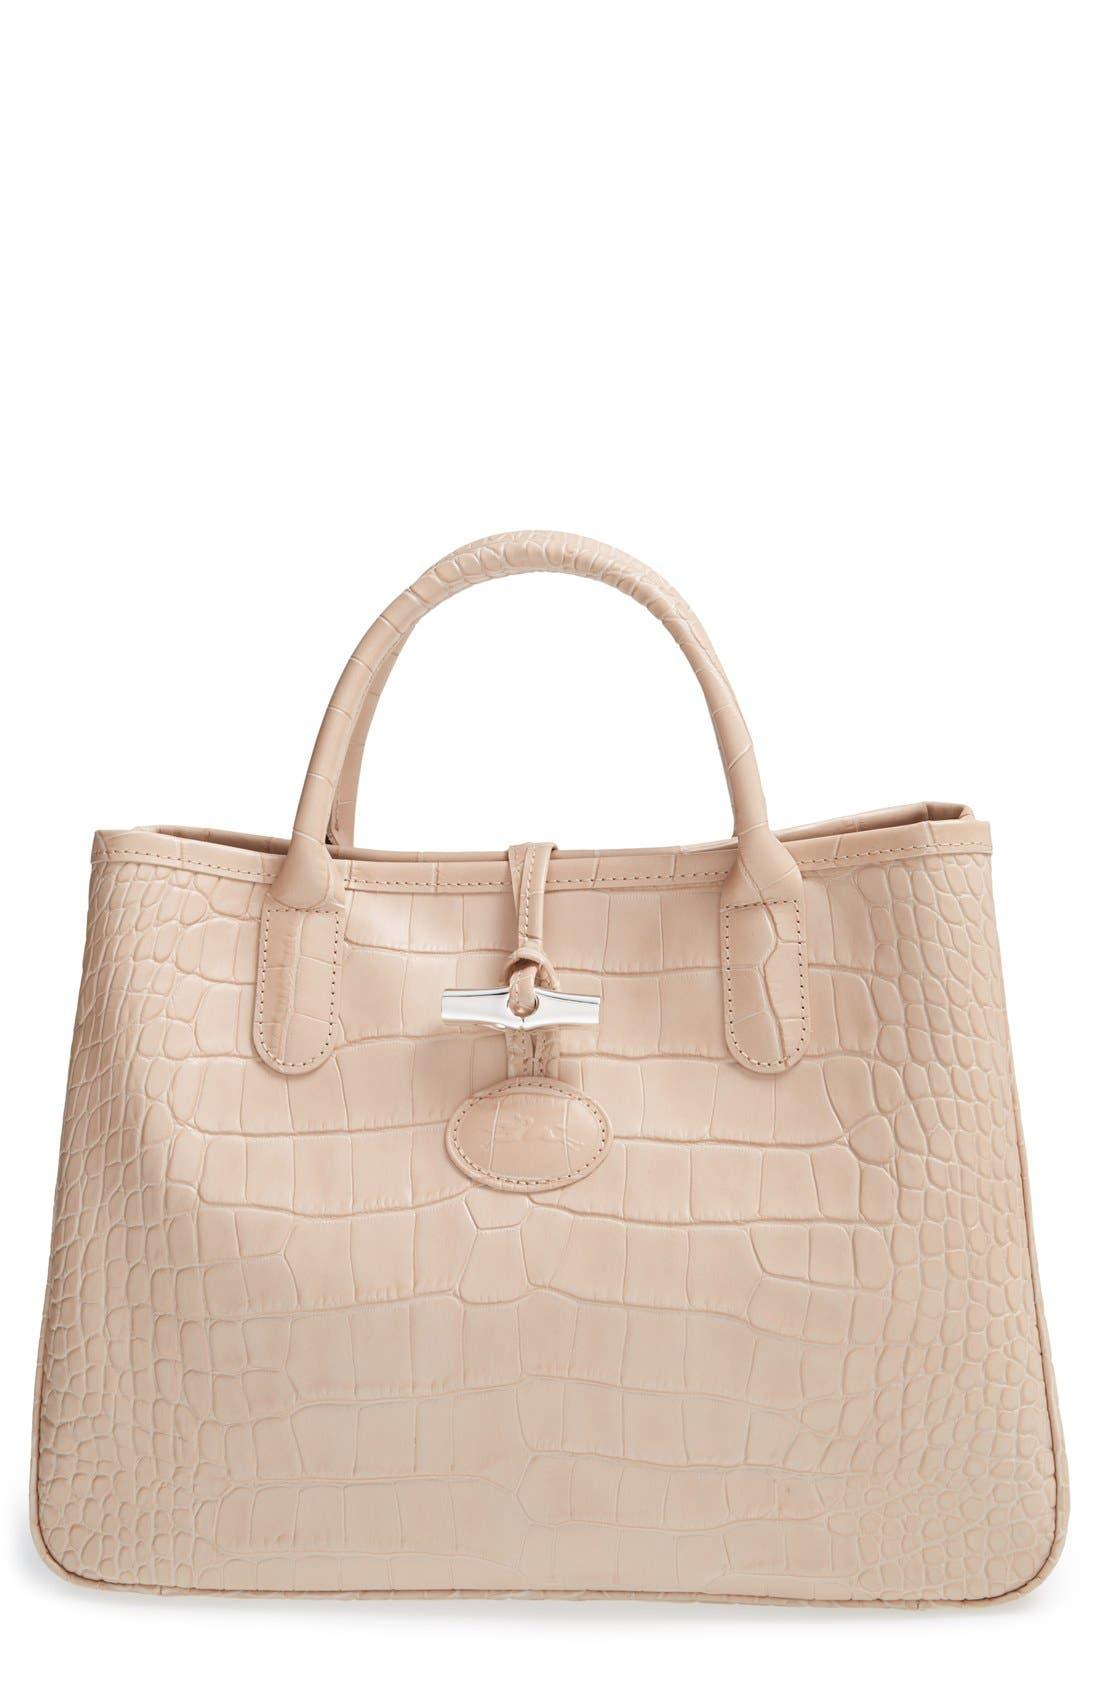 Alternate Image 1 Selected - Longchamp 'Small Roseau Croco' Shoulder Tote